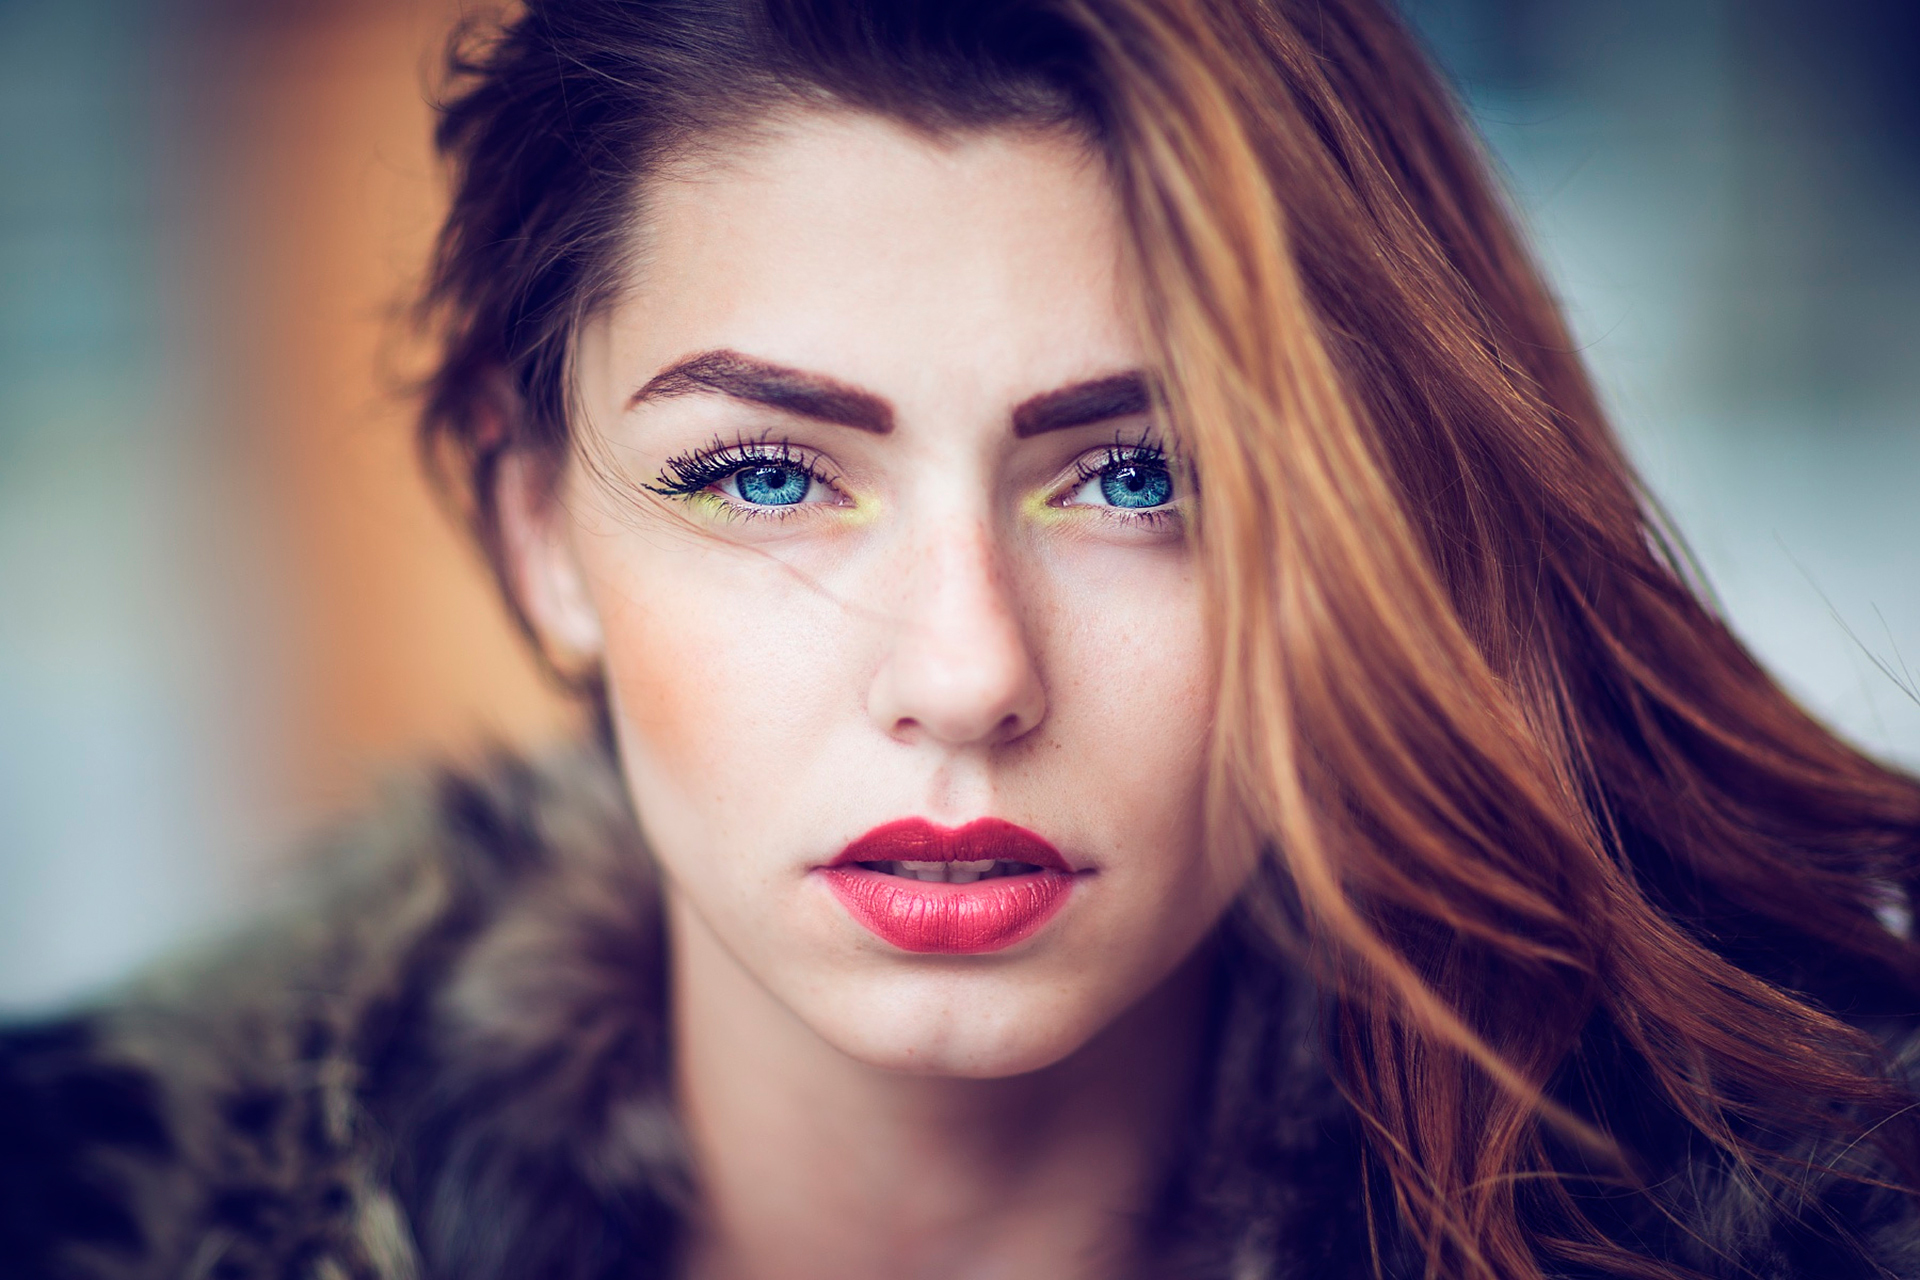 Лицо девушек фото 12